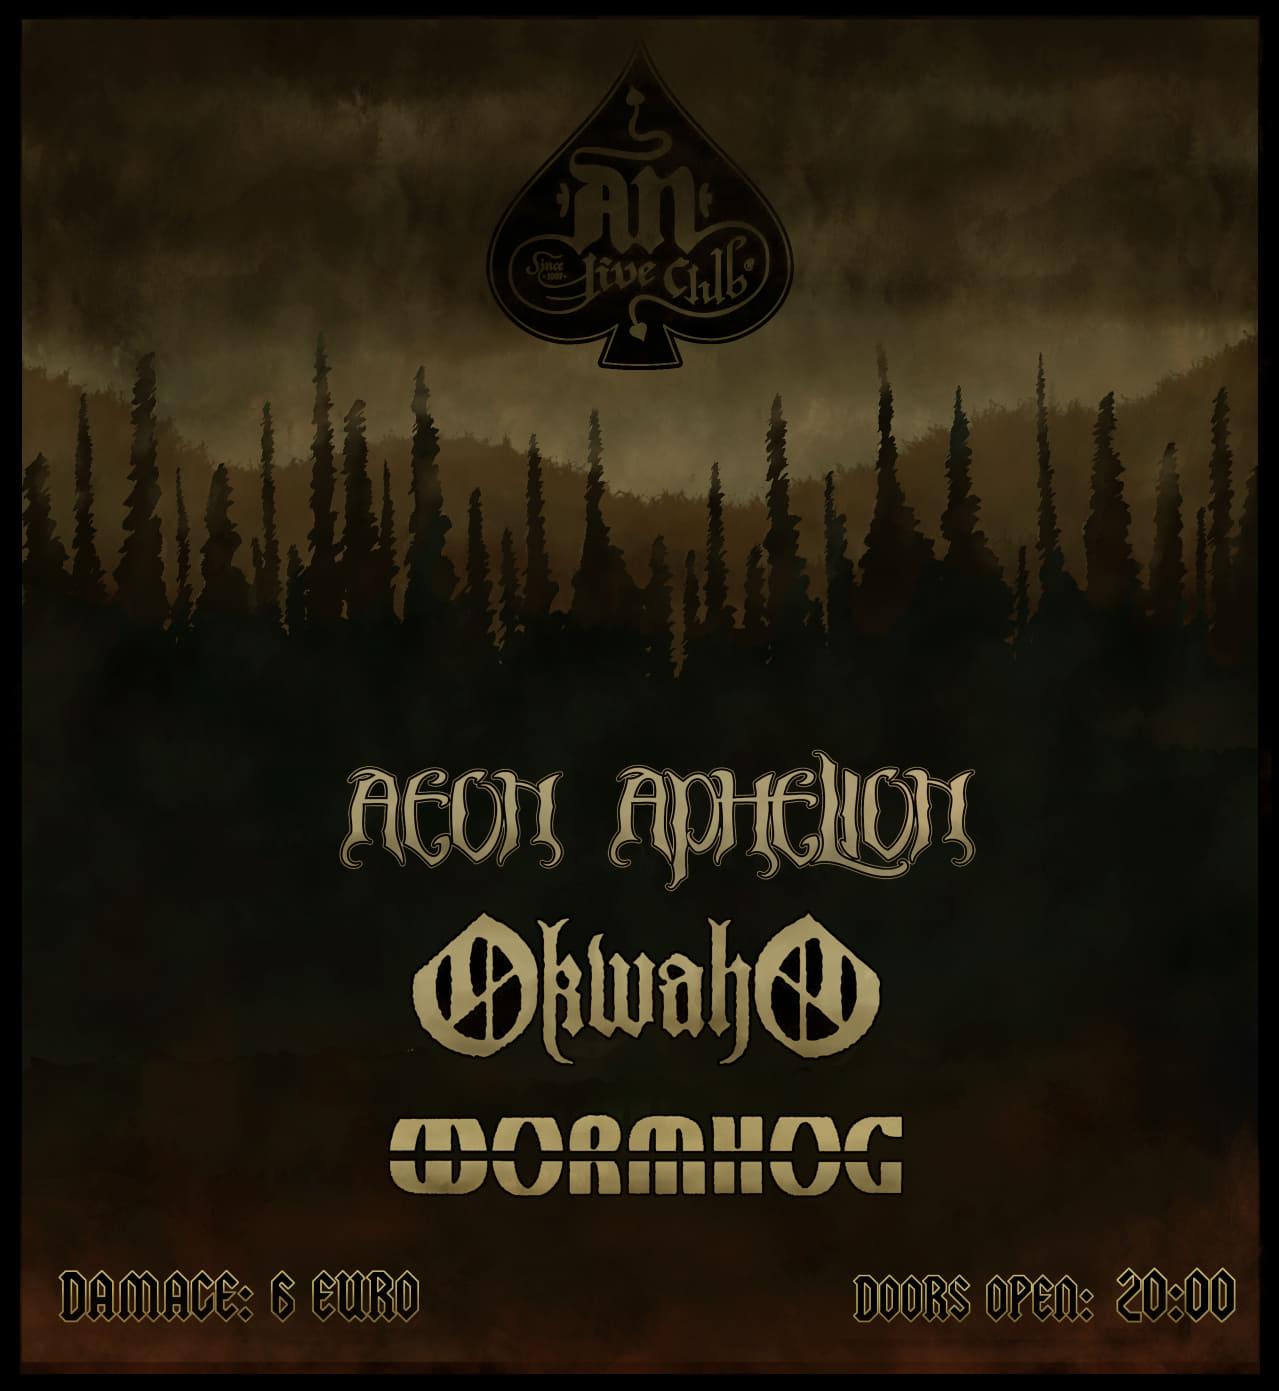 Aeon Aphelion, Okwaho, Wormhog 1 Feb poster